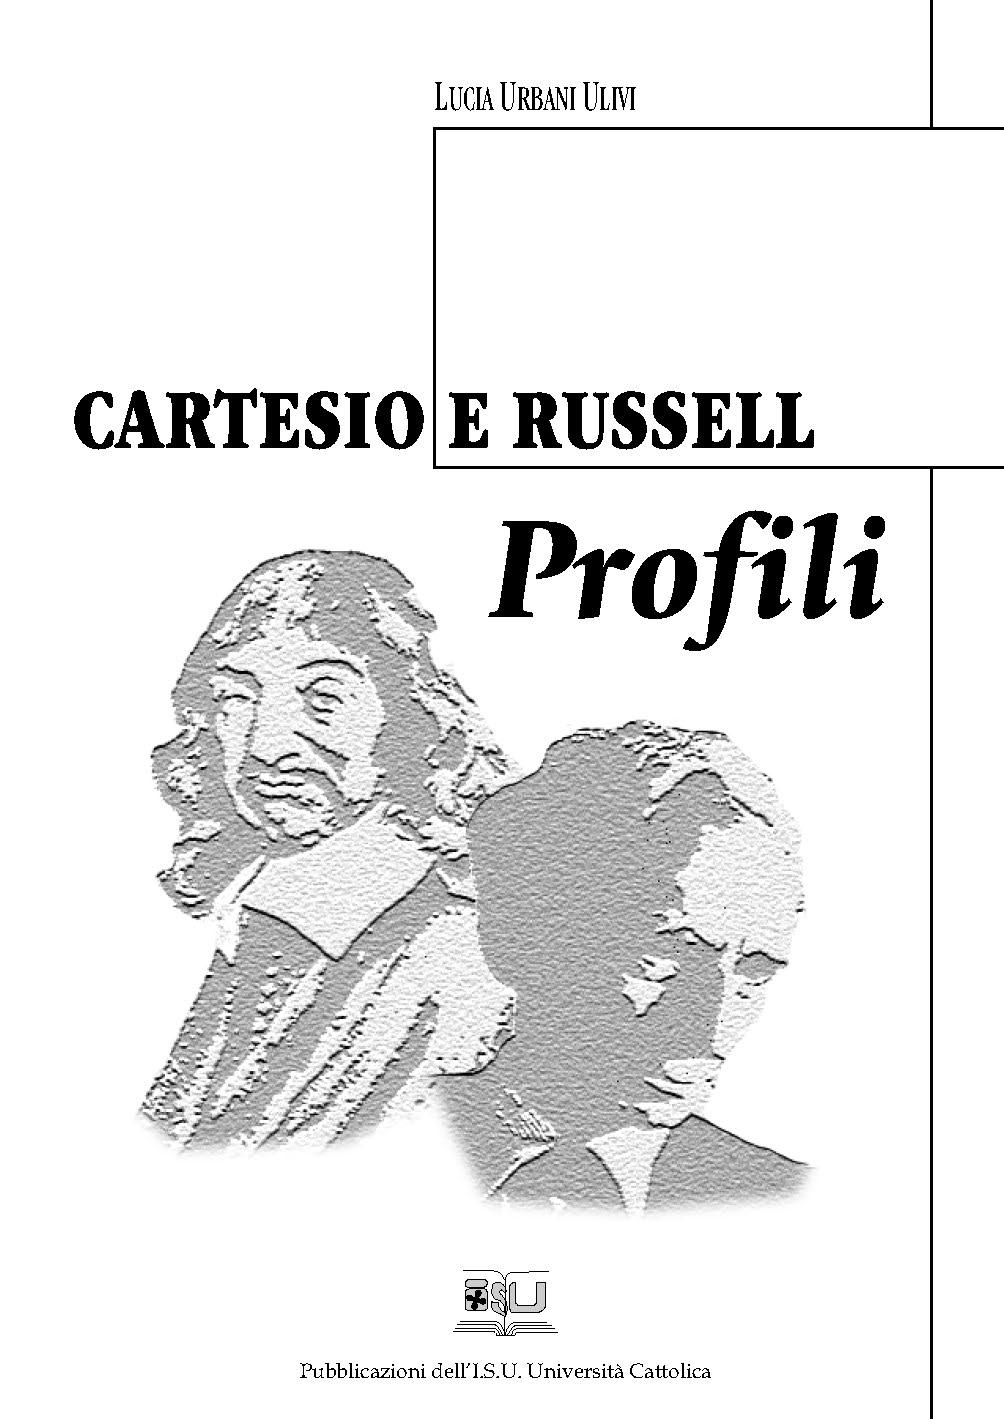 CARTESIO E RUSSELL. PROFILI